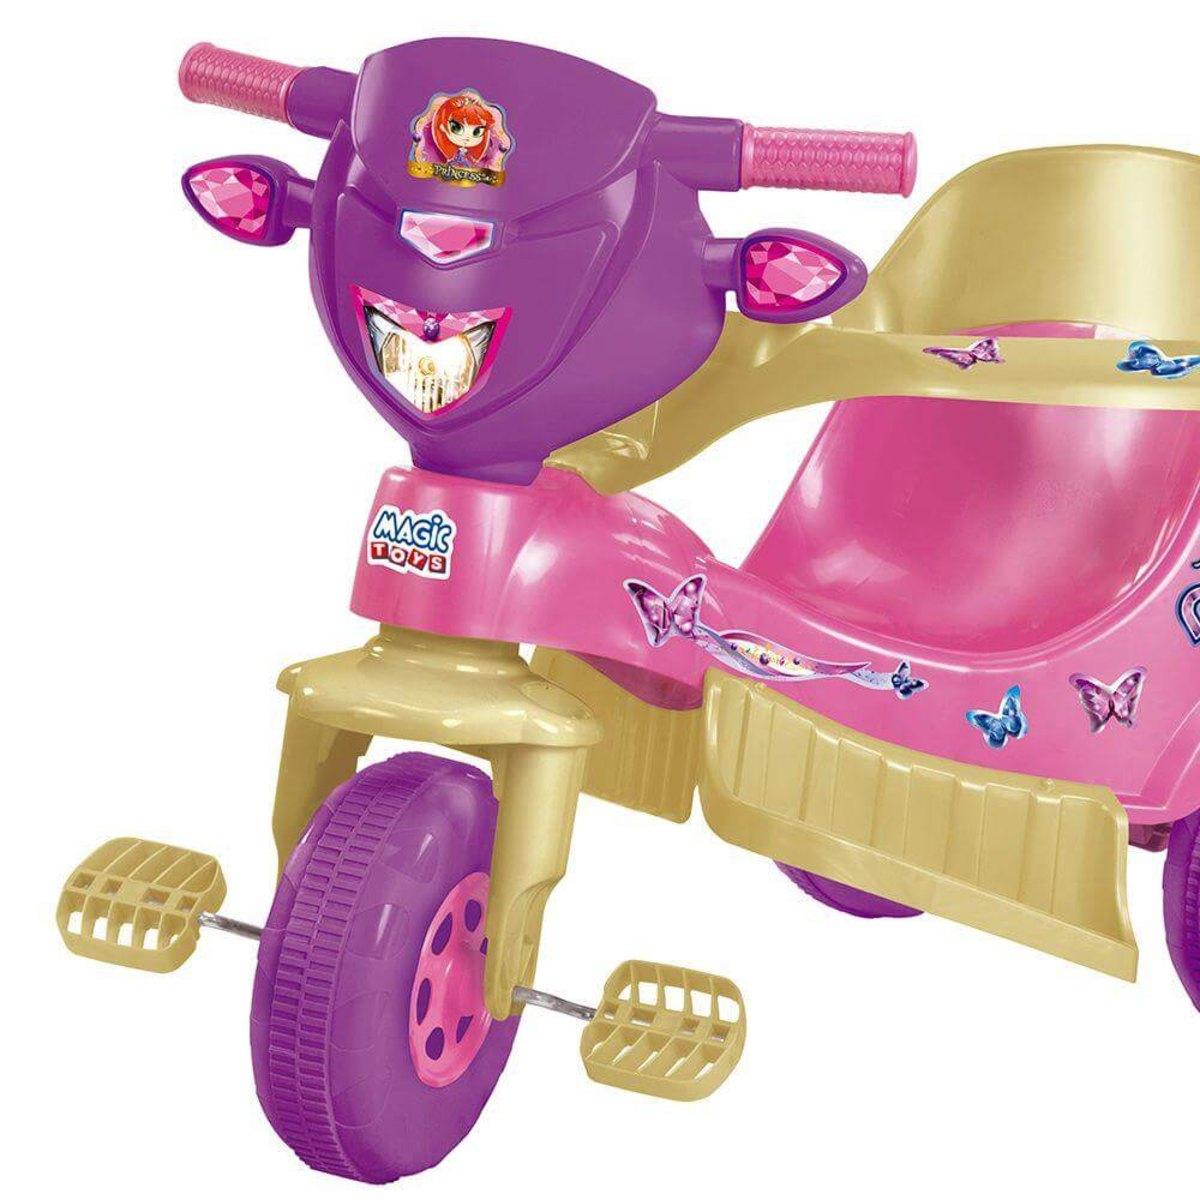 Triciclo Tico Tico Velo Toys Princess Meg 3726C Magic Toys